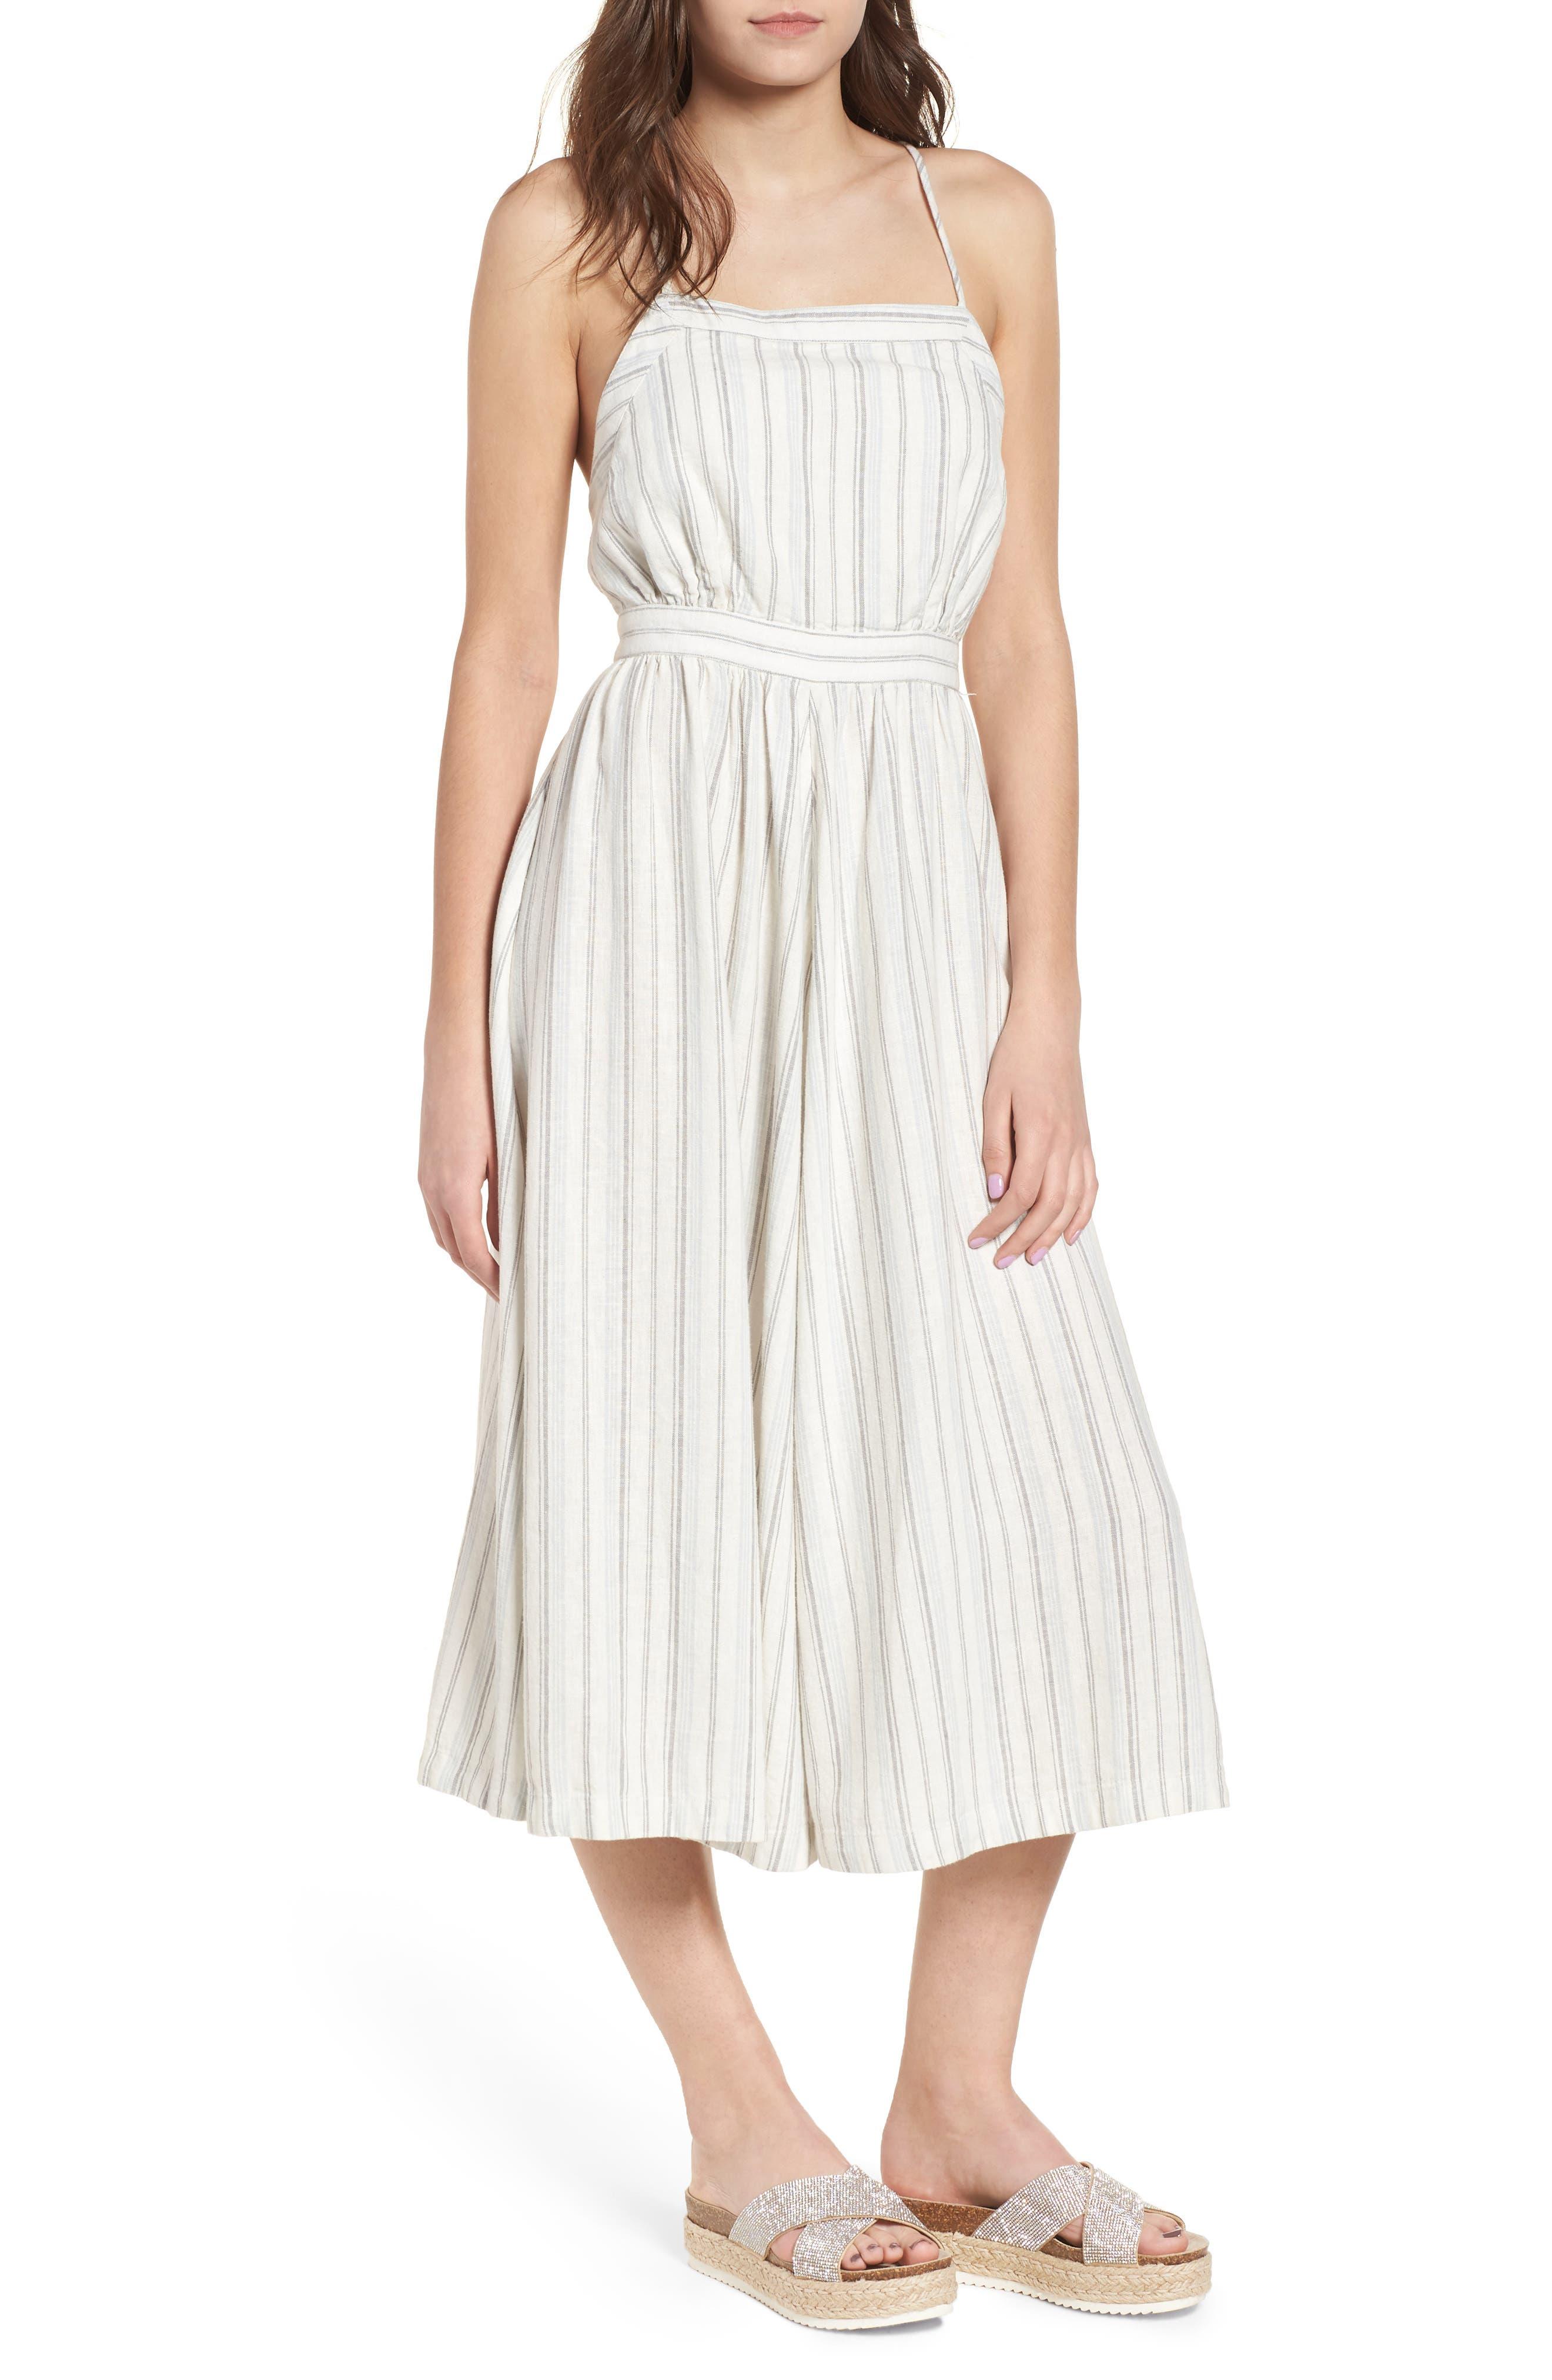 Stripe Apron Dress,                             Main thumbnail 1, color,                             Ivory Verigated Stripe